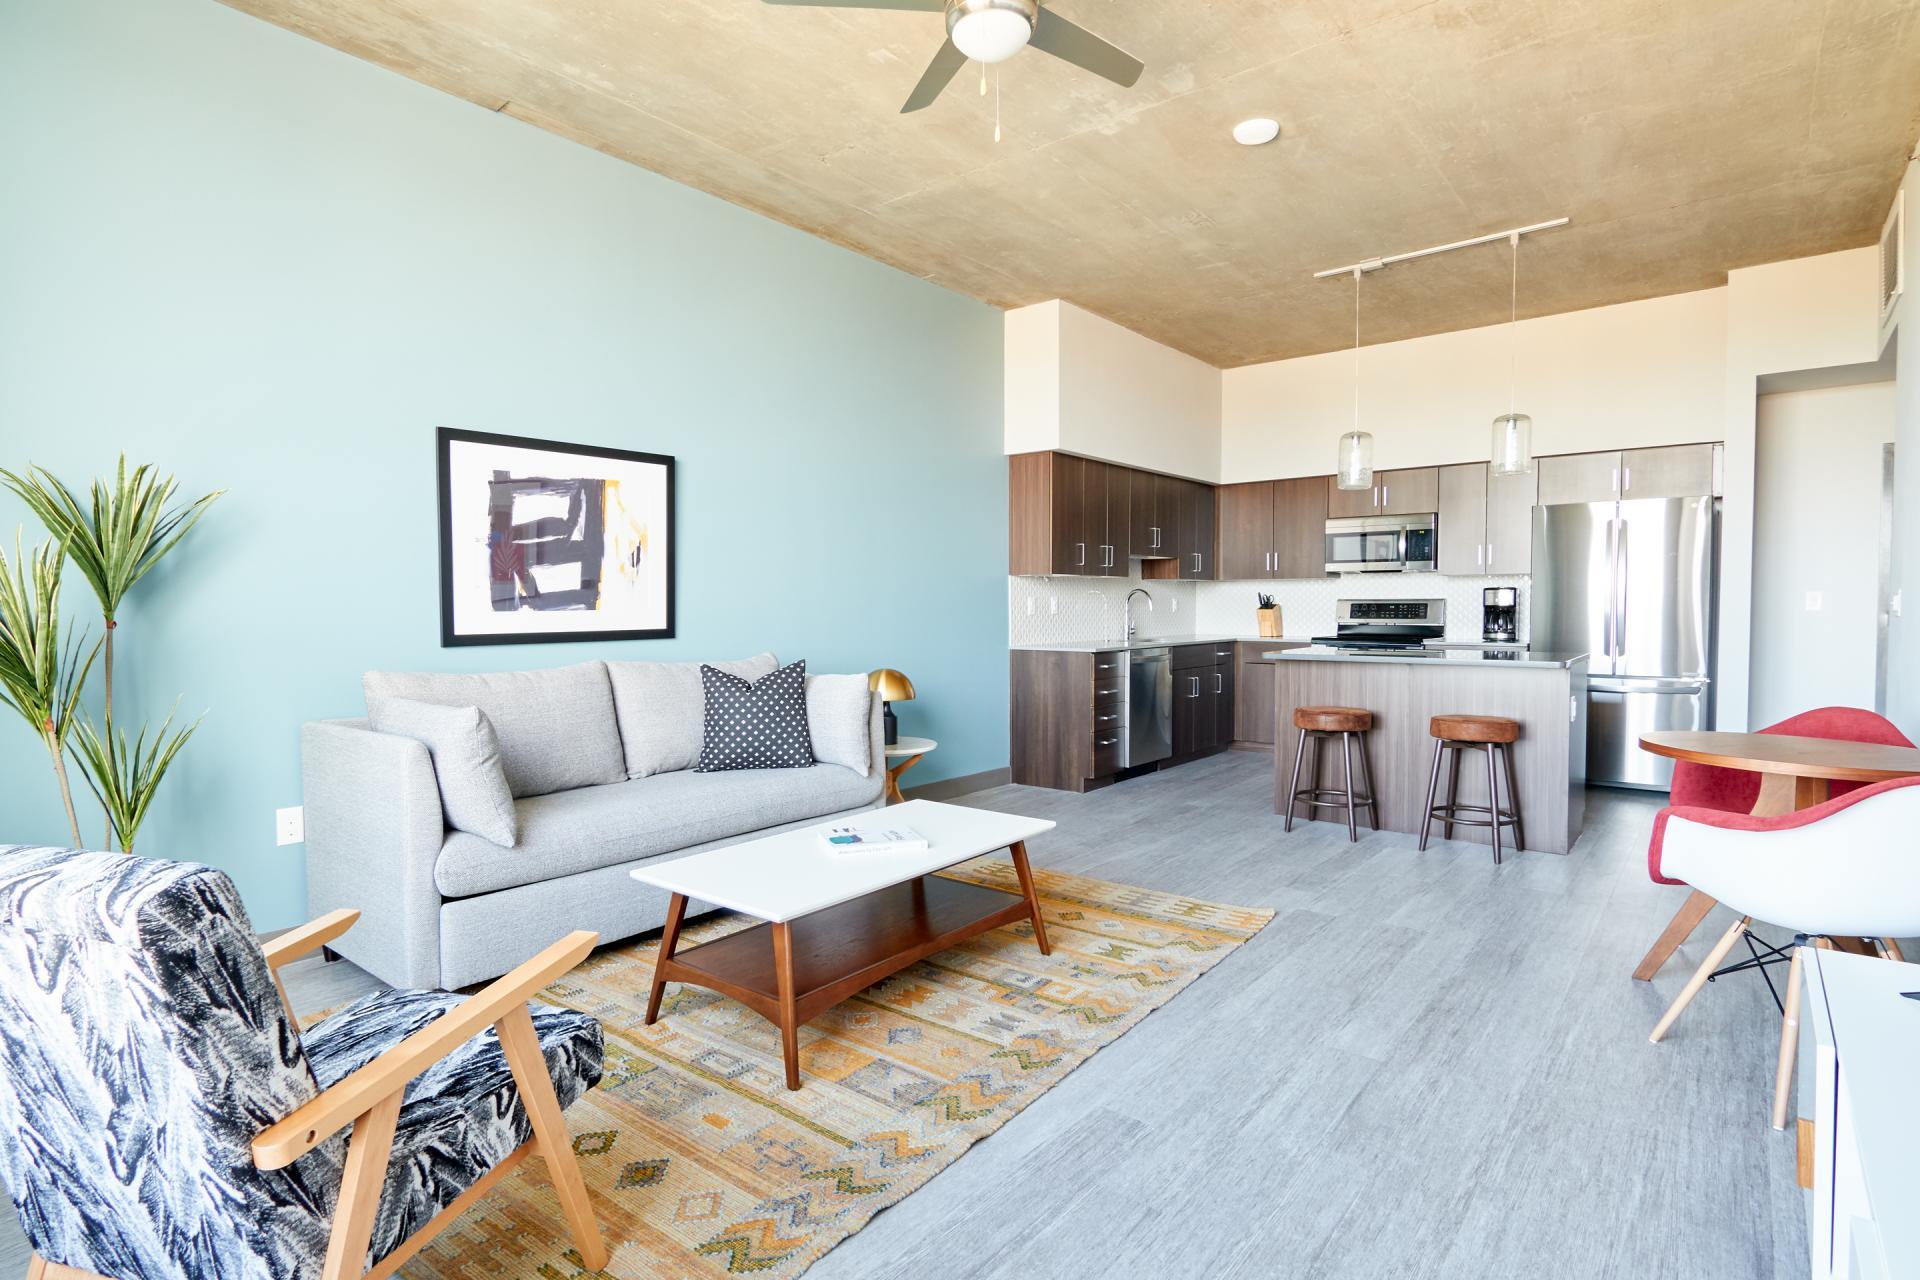 Living area at McKinley Apartments, Center, Phoenix